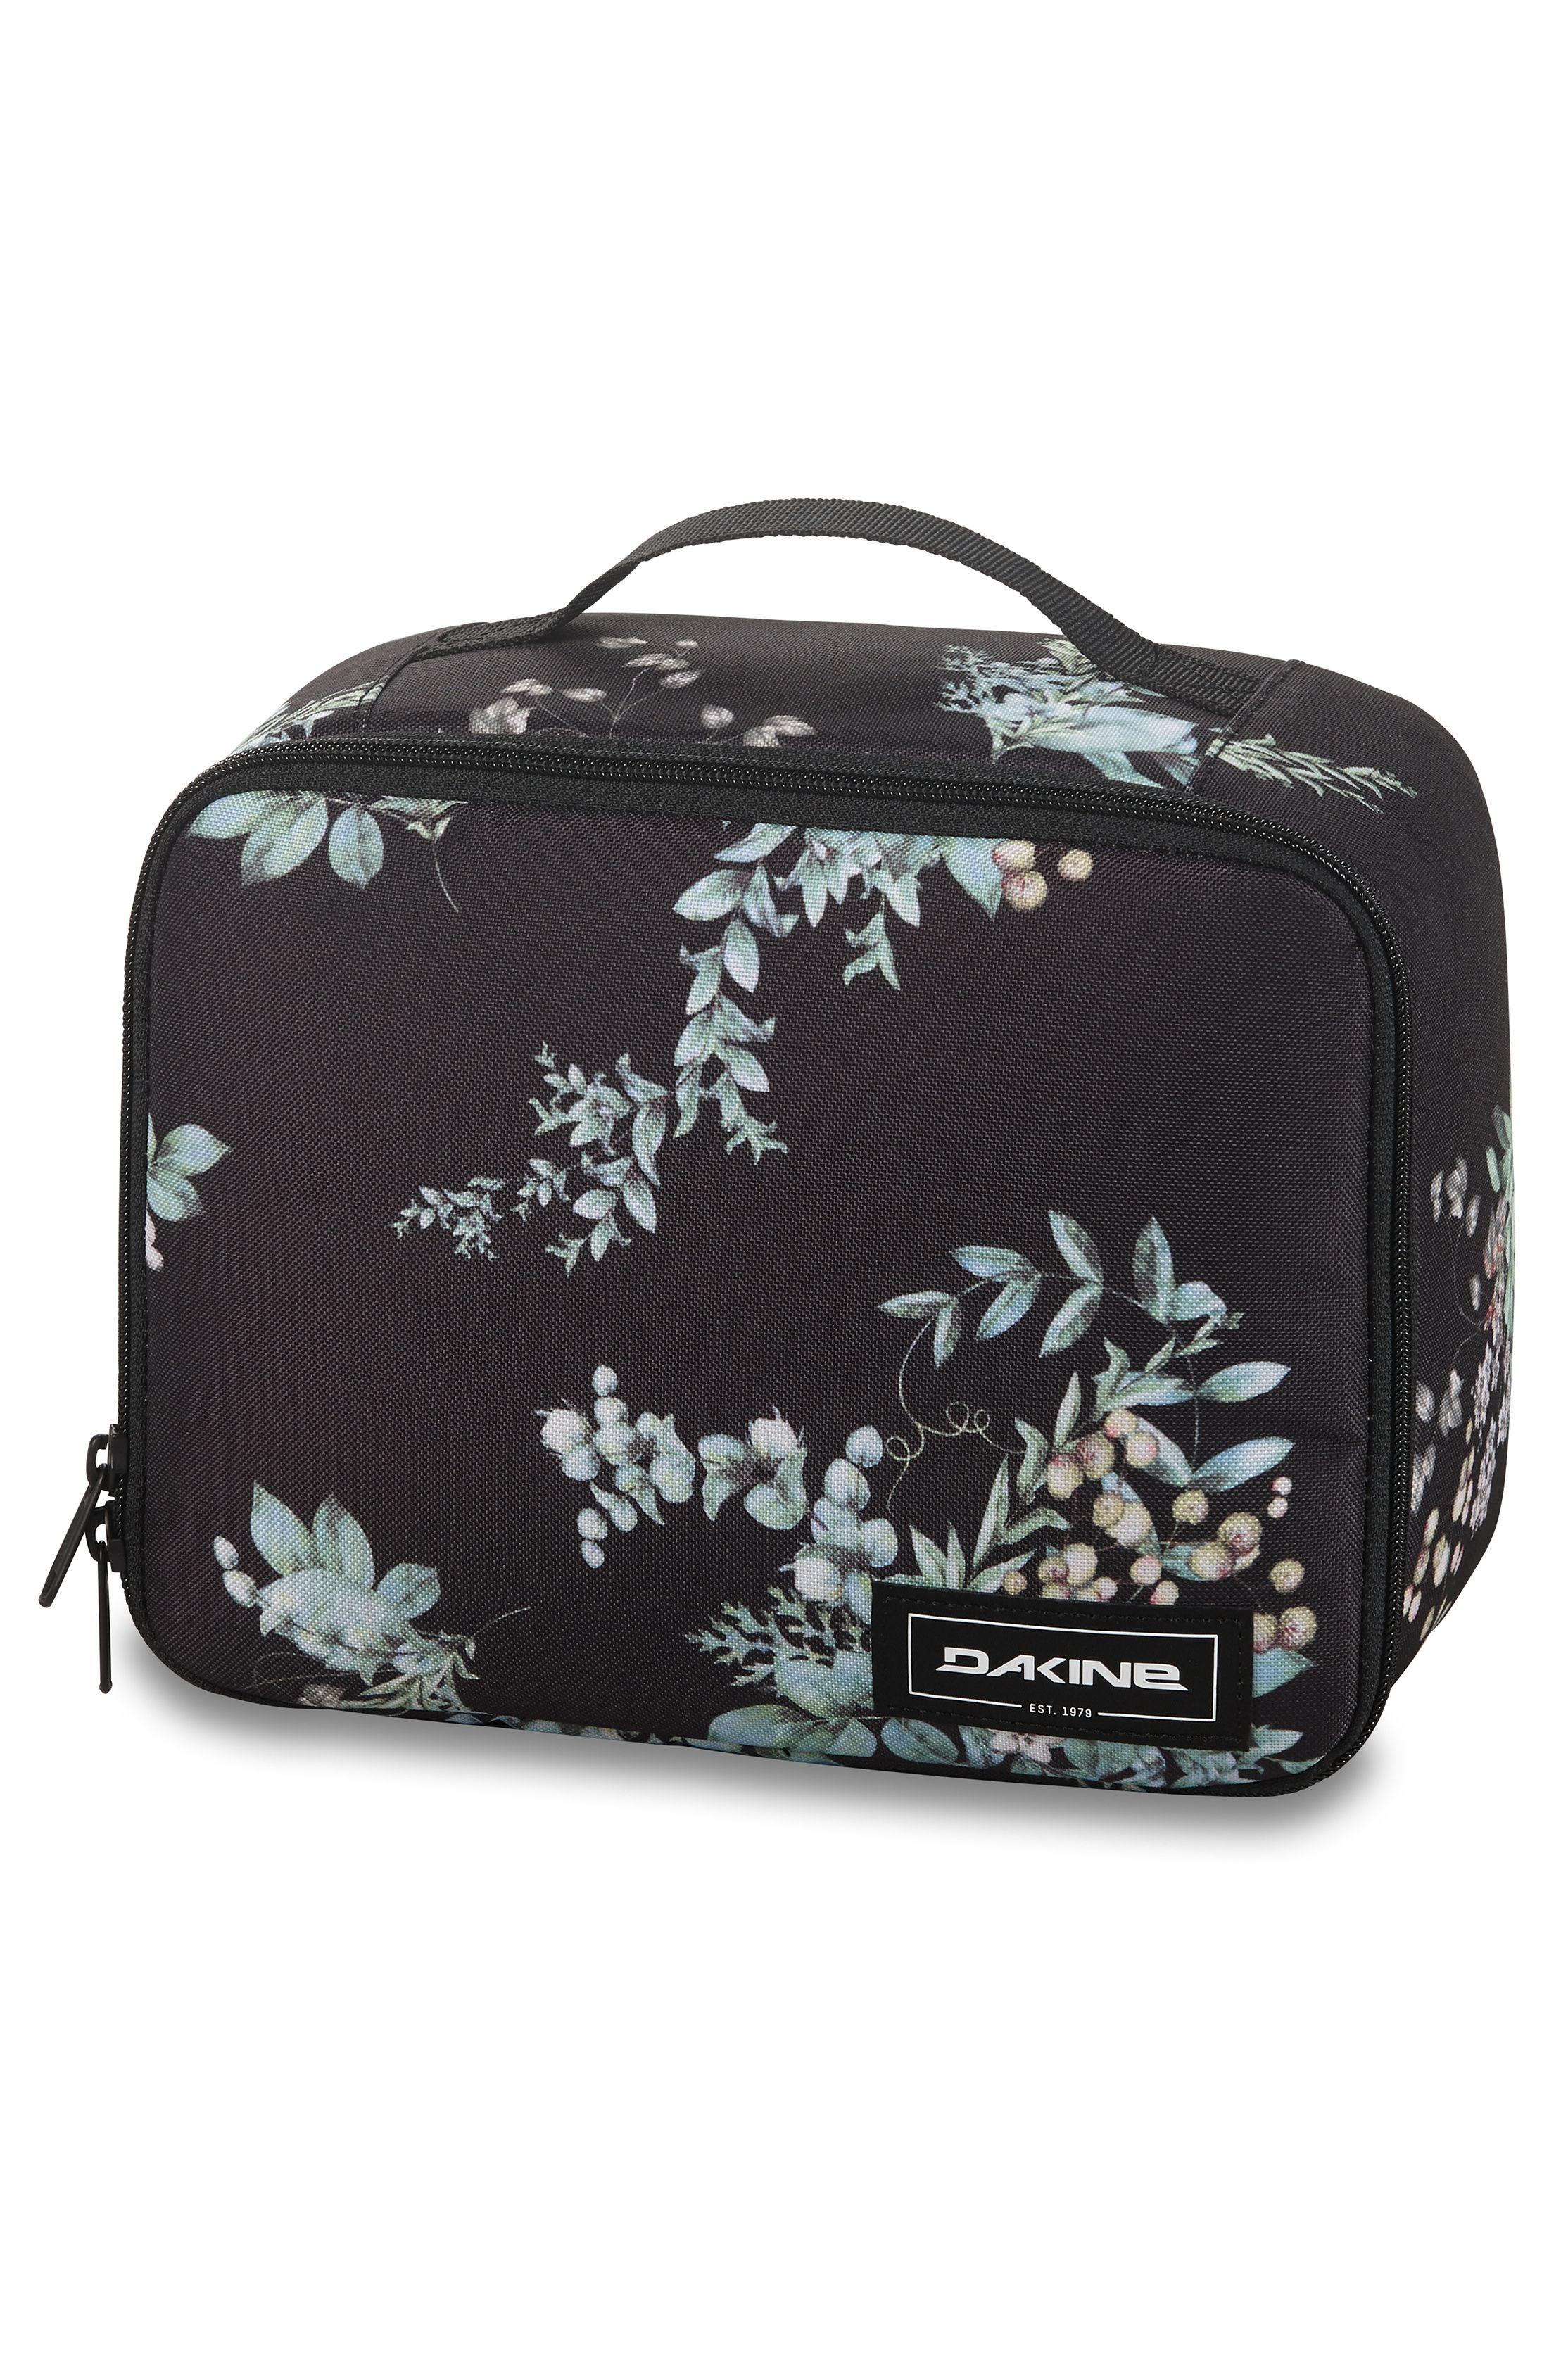 Bolsa Dakine LUNCH BOX 5L Solstice Floral